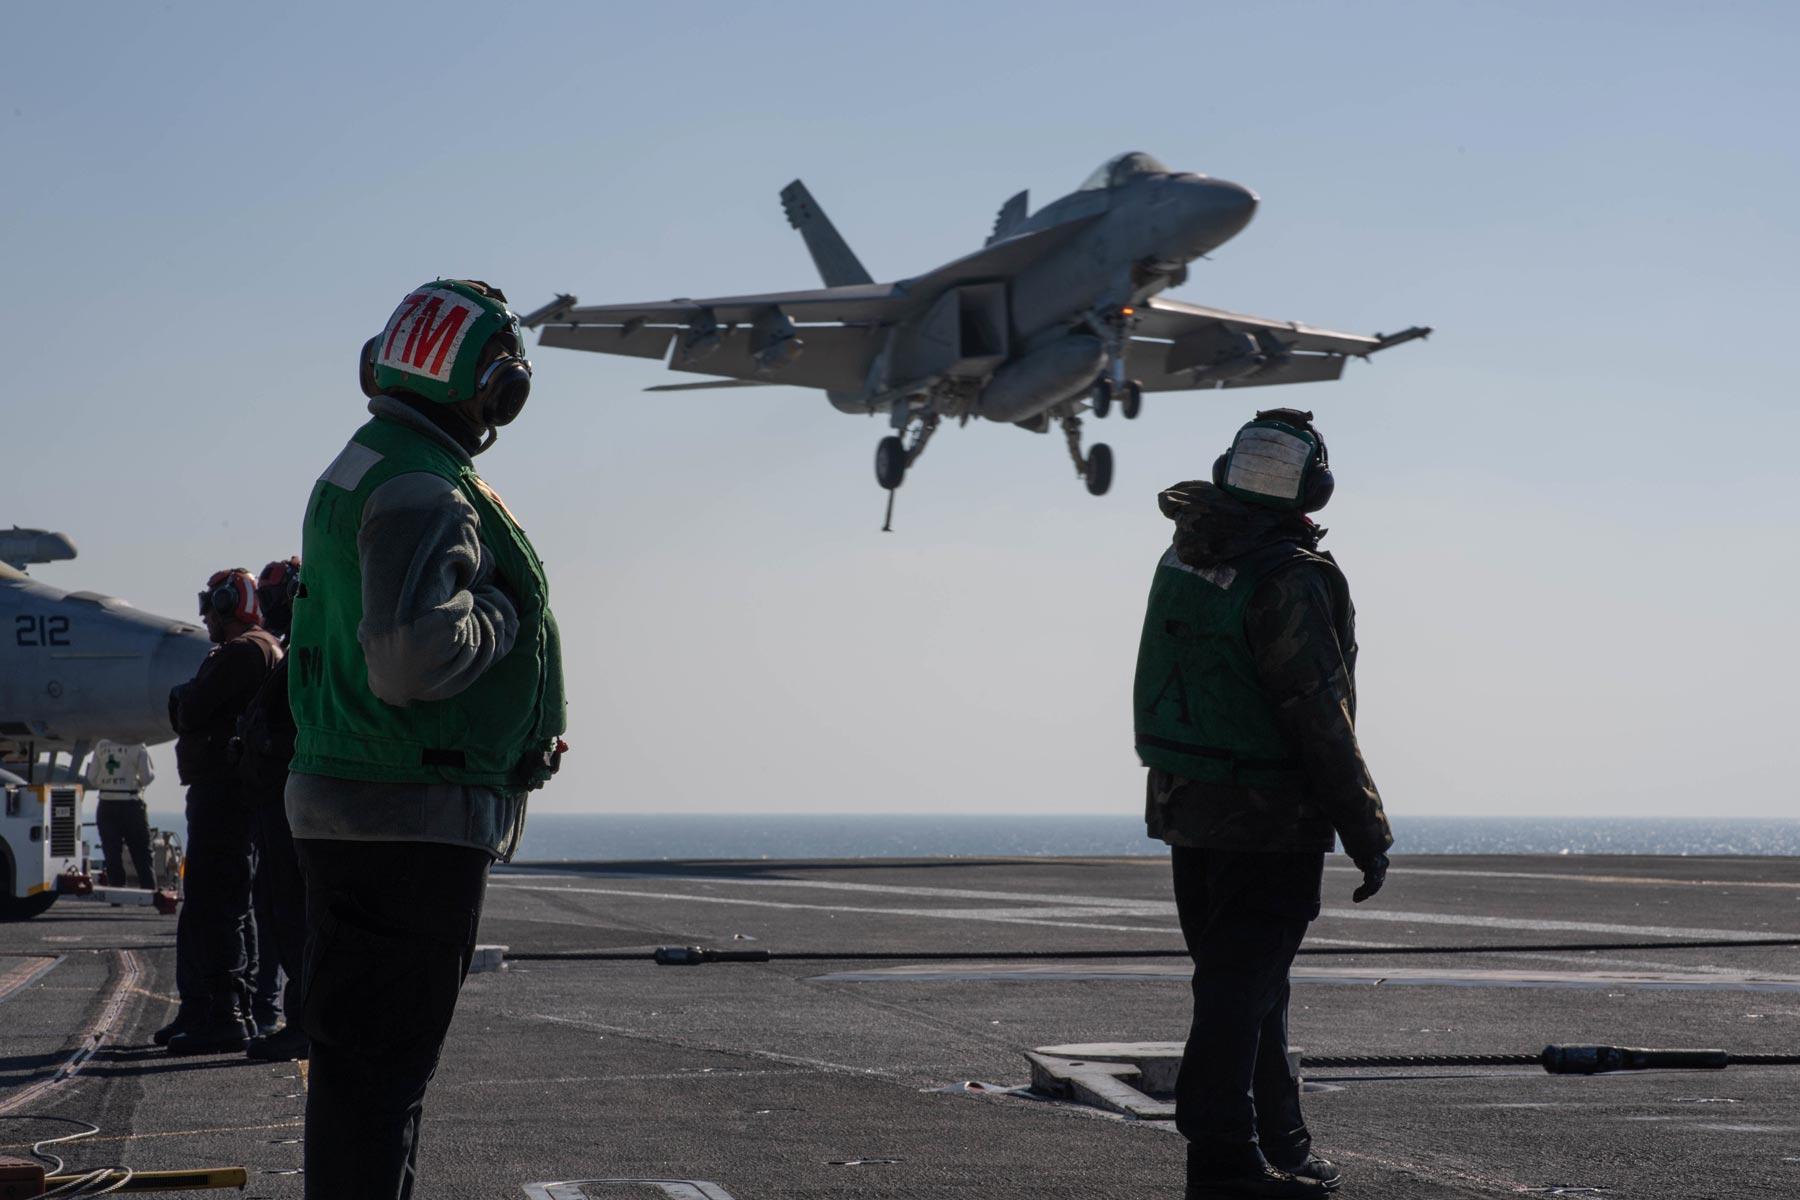 US Bolsters Forces in Region as Syria Withdrawal Begins